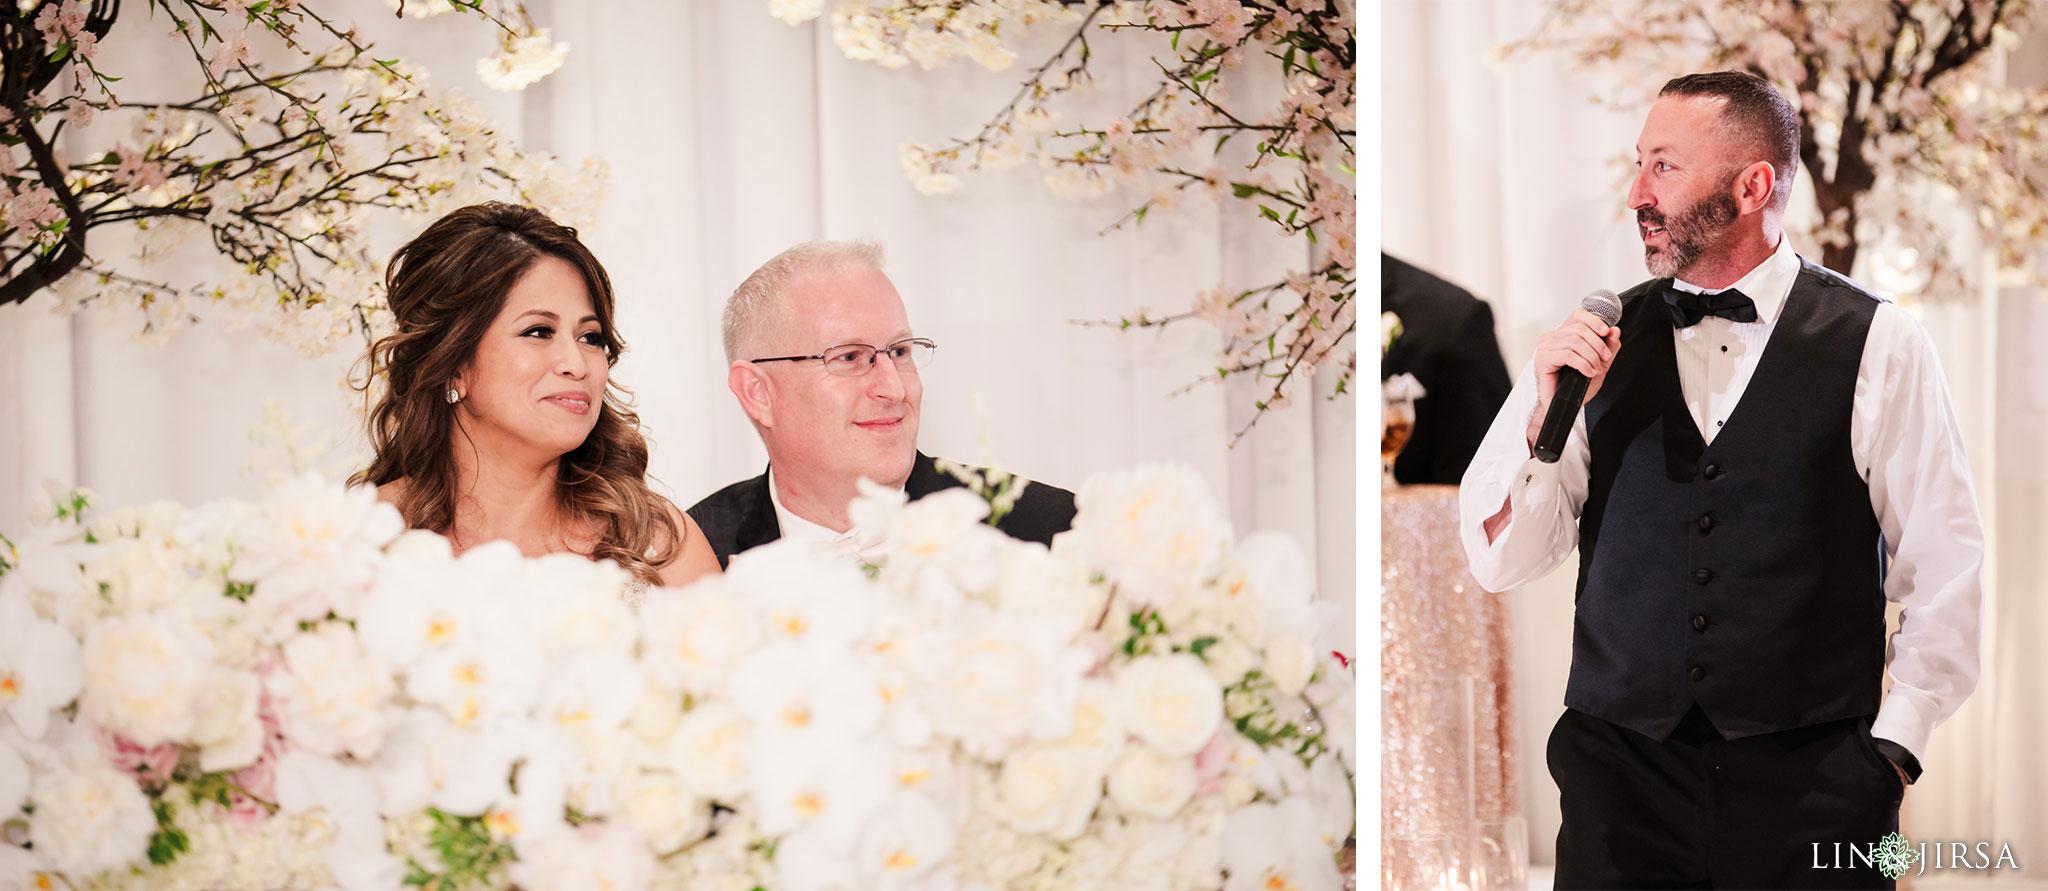 21 venue by three petals huntington beach wedding photography 1